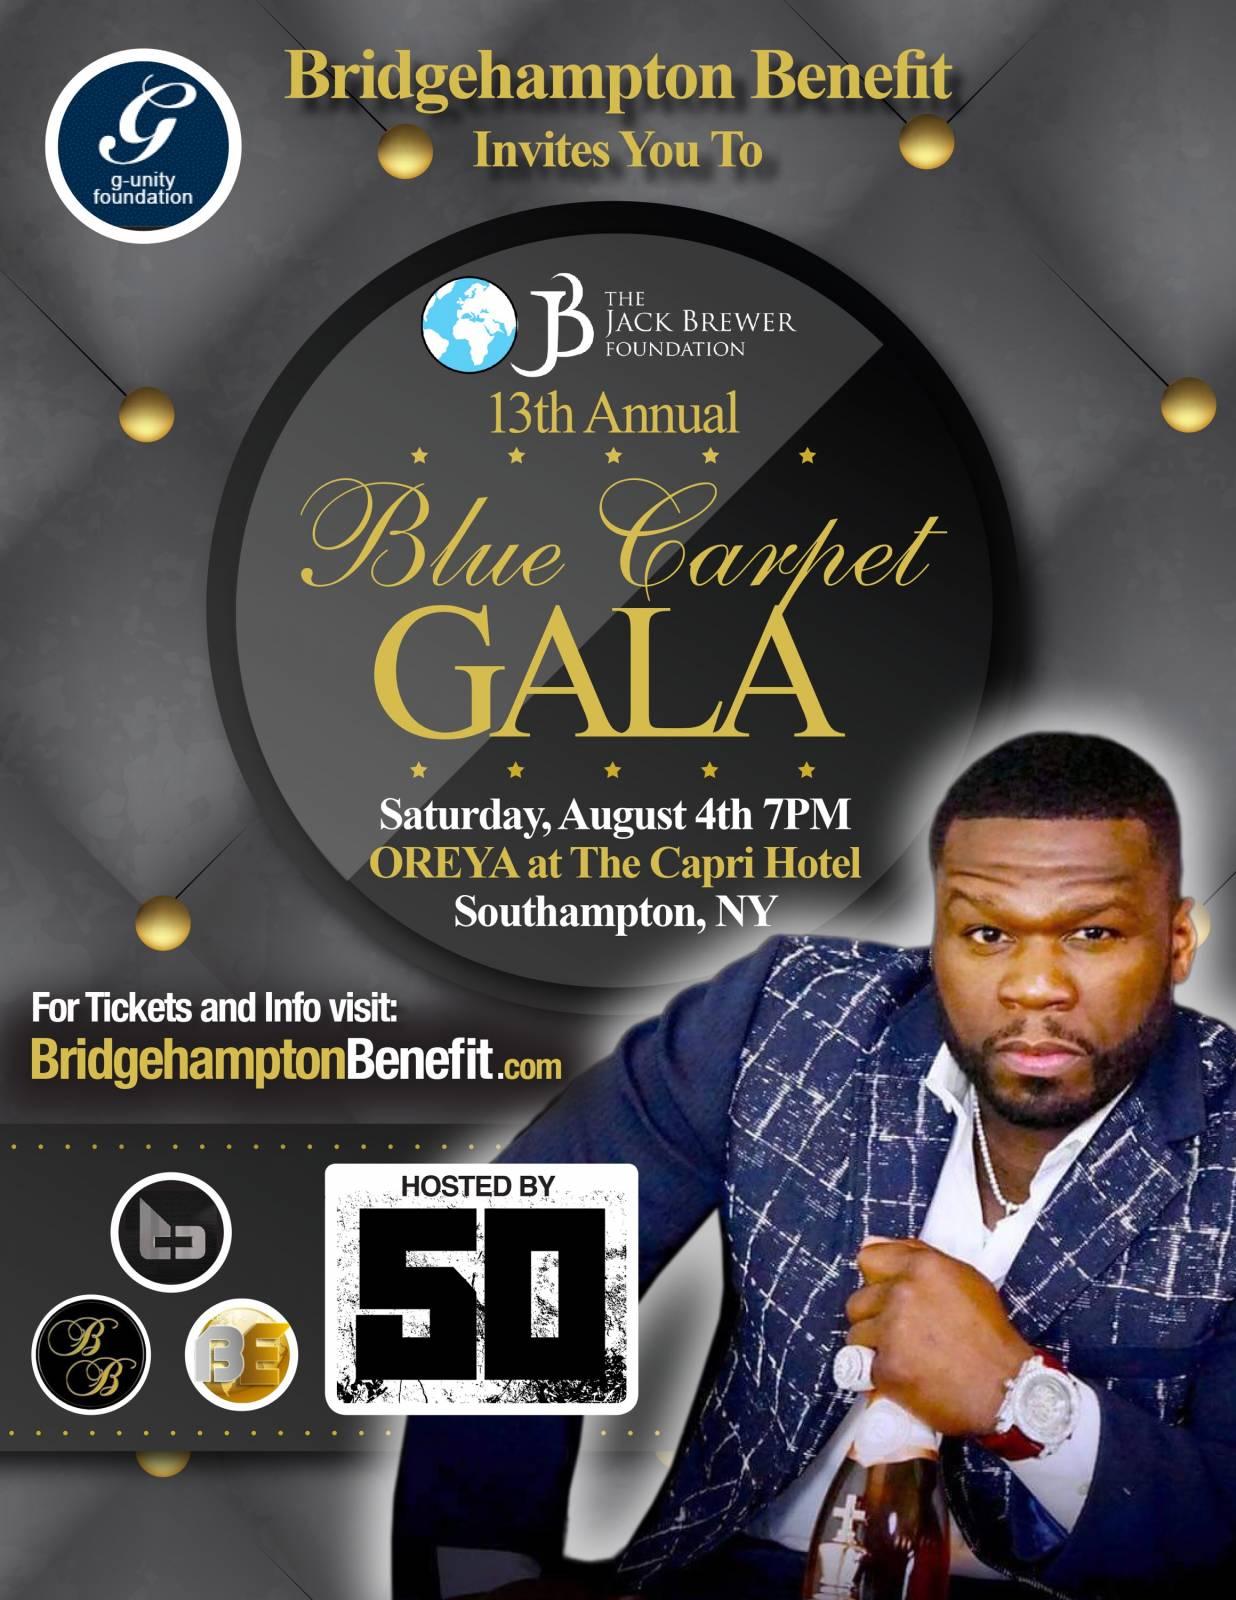 Bridgehampton Benefit to Host 13th Annual Blue Carpet Gala With 50 Cent [Event]